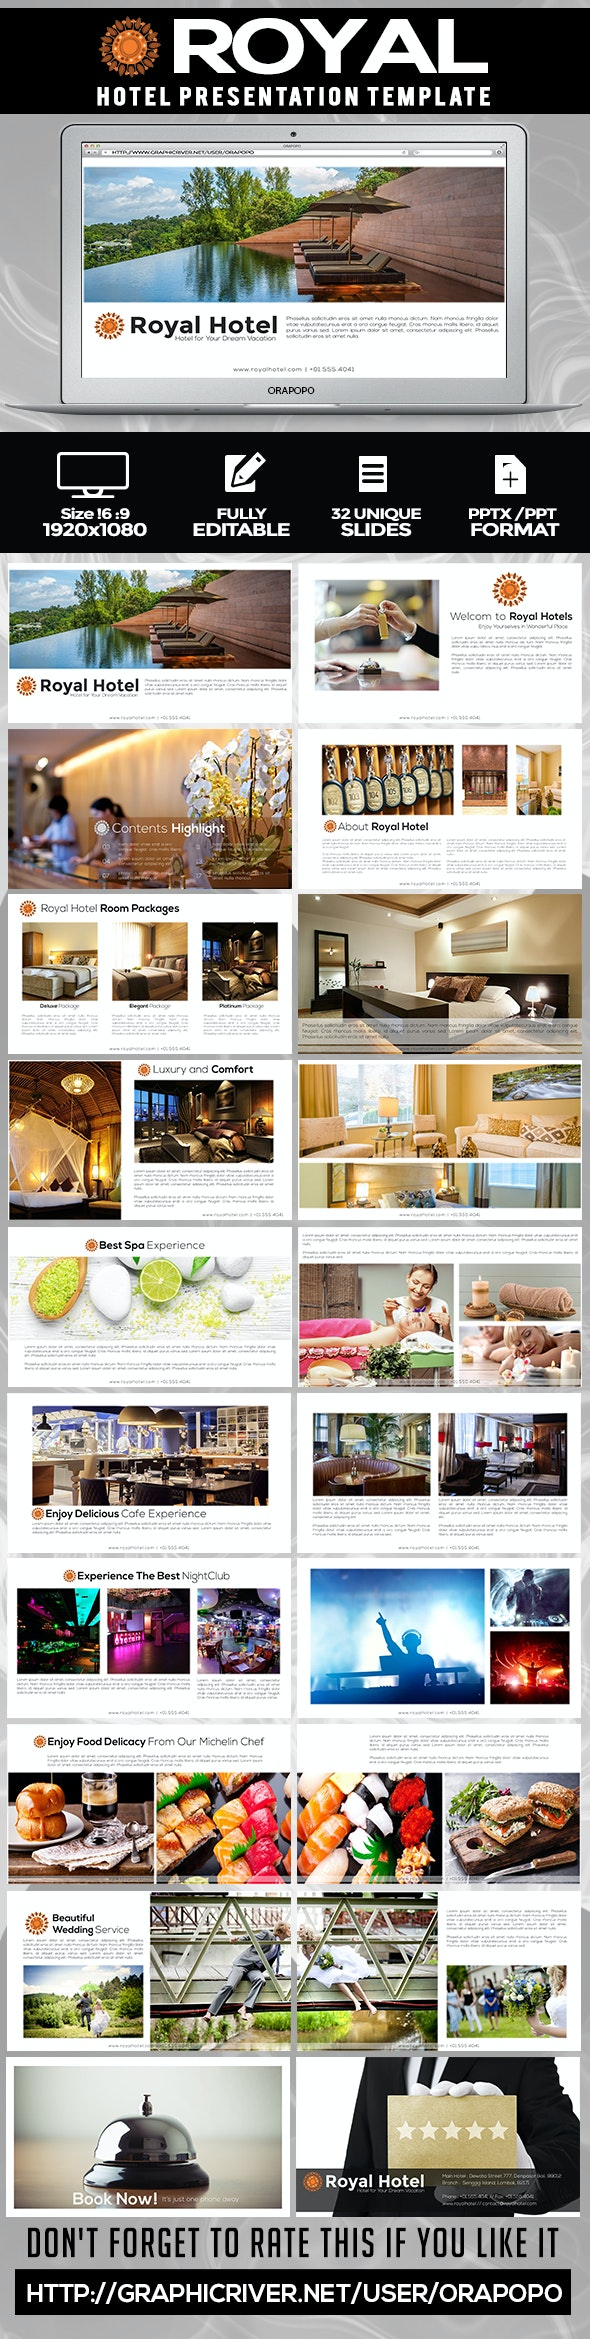 Royal ~ Hotel Presentation Template - Creative PowerPoint Templates